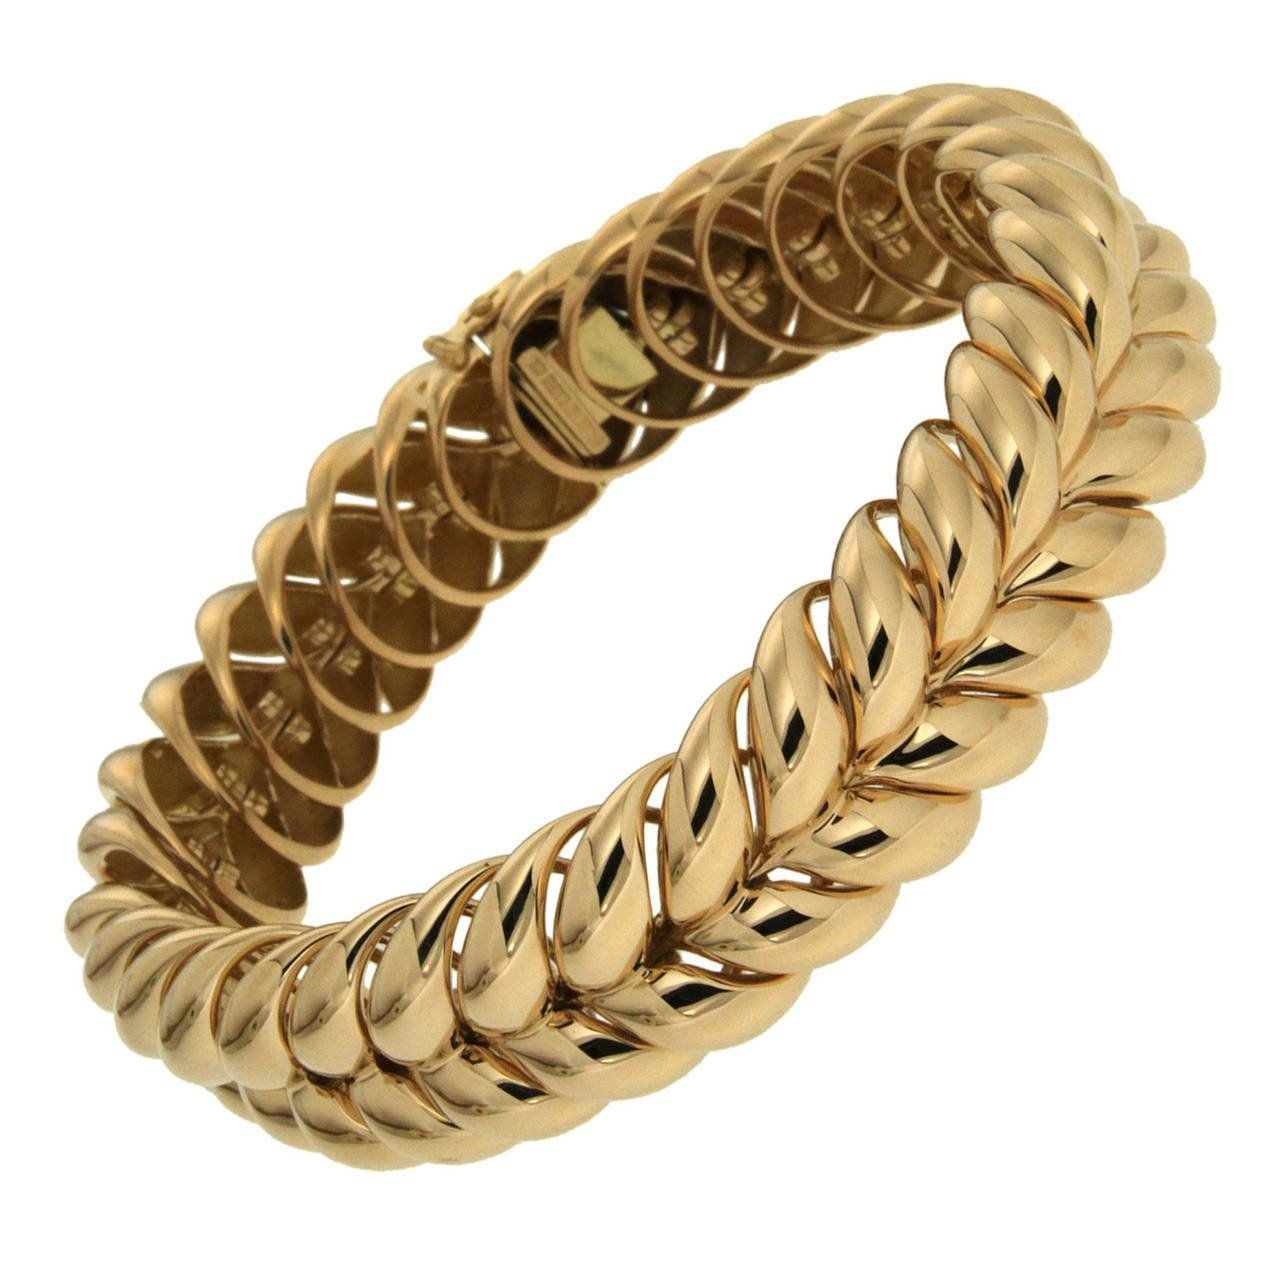 Bespoke valentin magro gold rope bracelet bespoke bracelets and gold